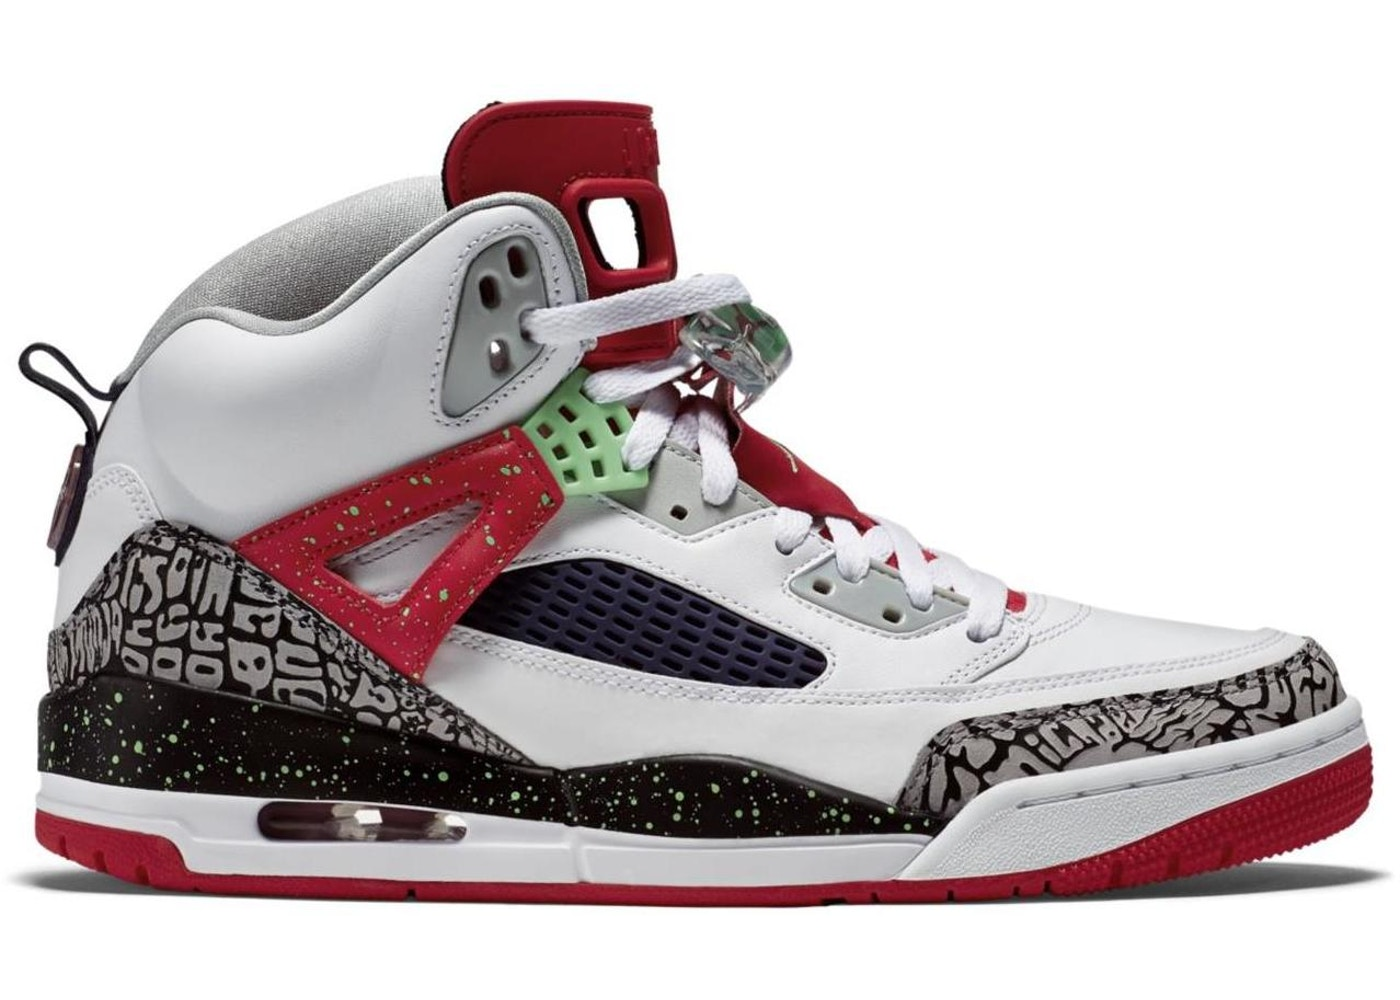 quality design 06a5e 73a38 Air Jordan Spizike Size 17 Shoes - Average Sale Price